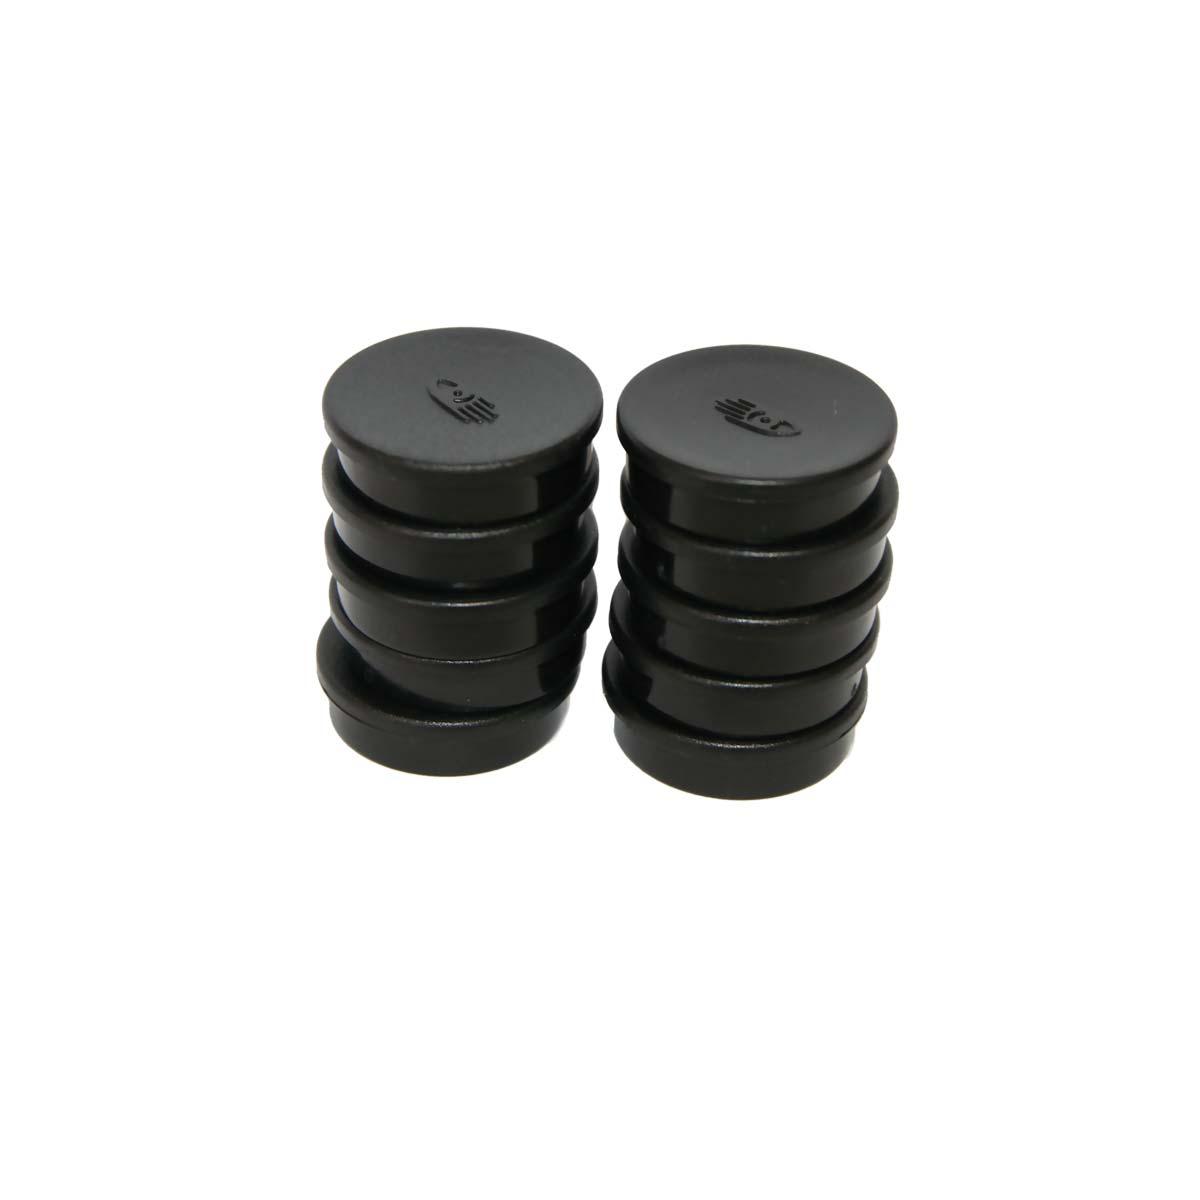 Black circle magnets